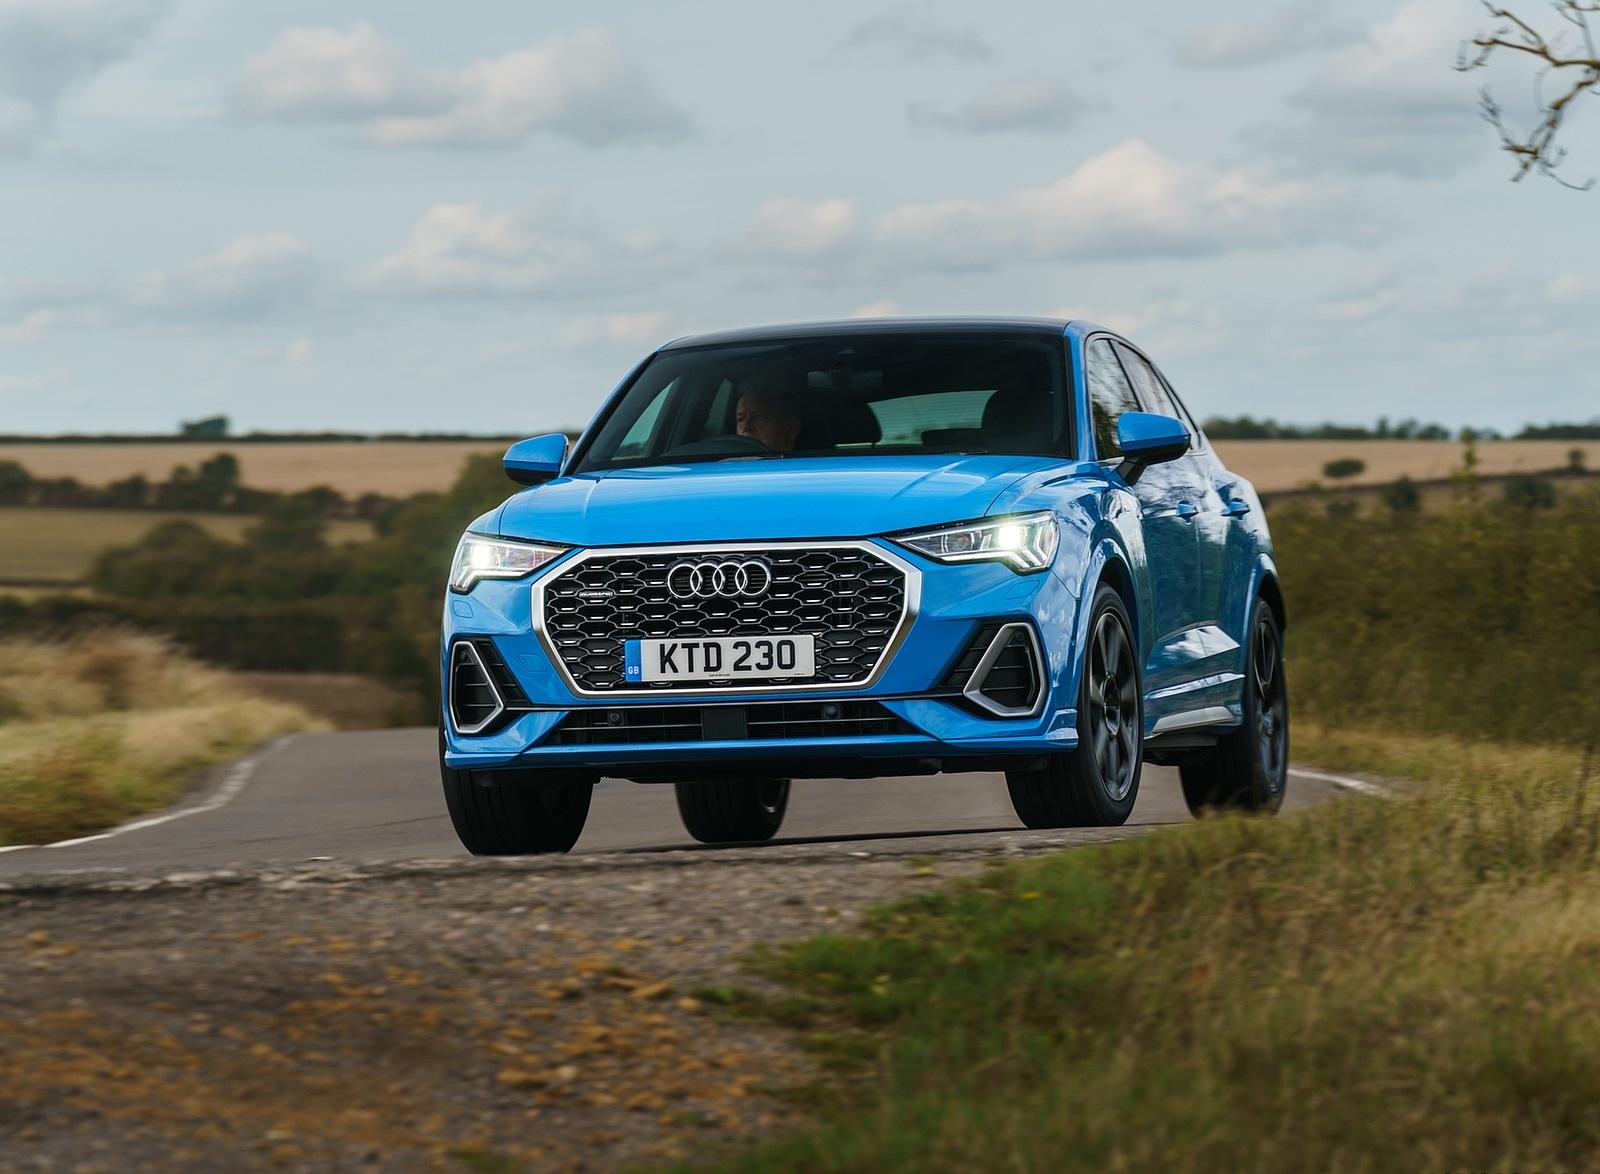 2020 Audi Q3 Sportback 45 TFSI quattro (UK-Spec) Front Wallpapers (15)